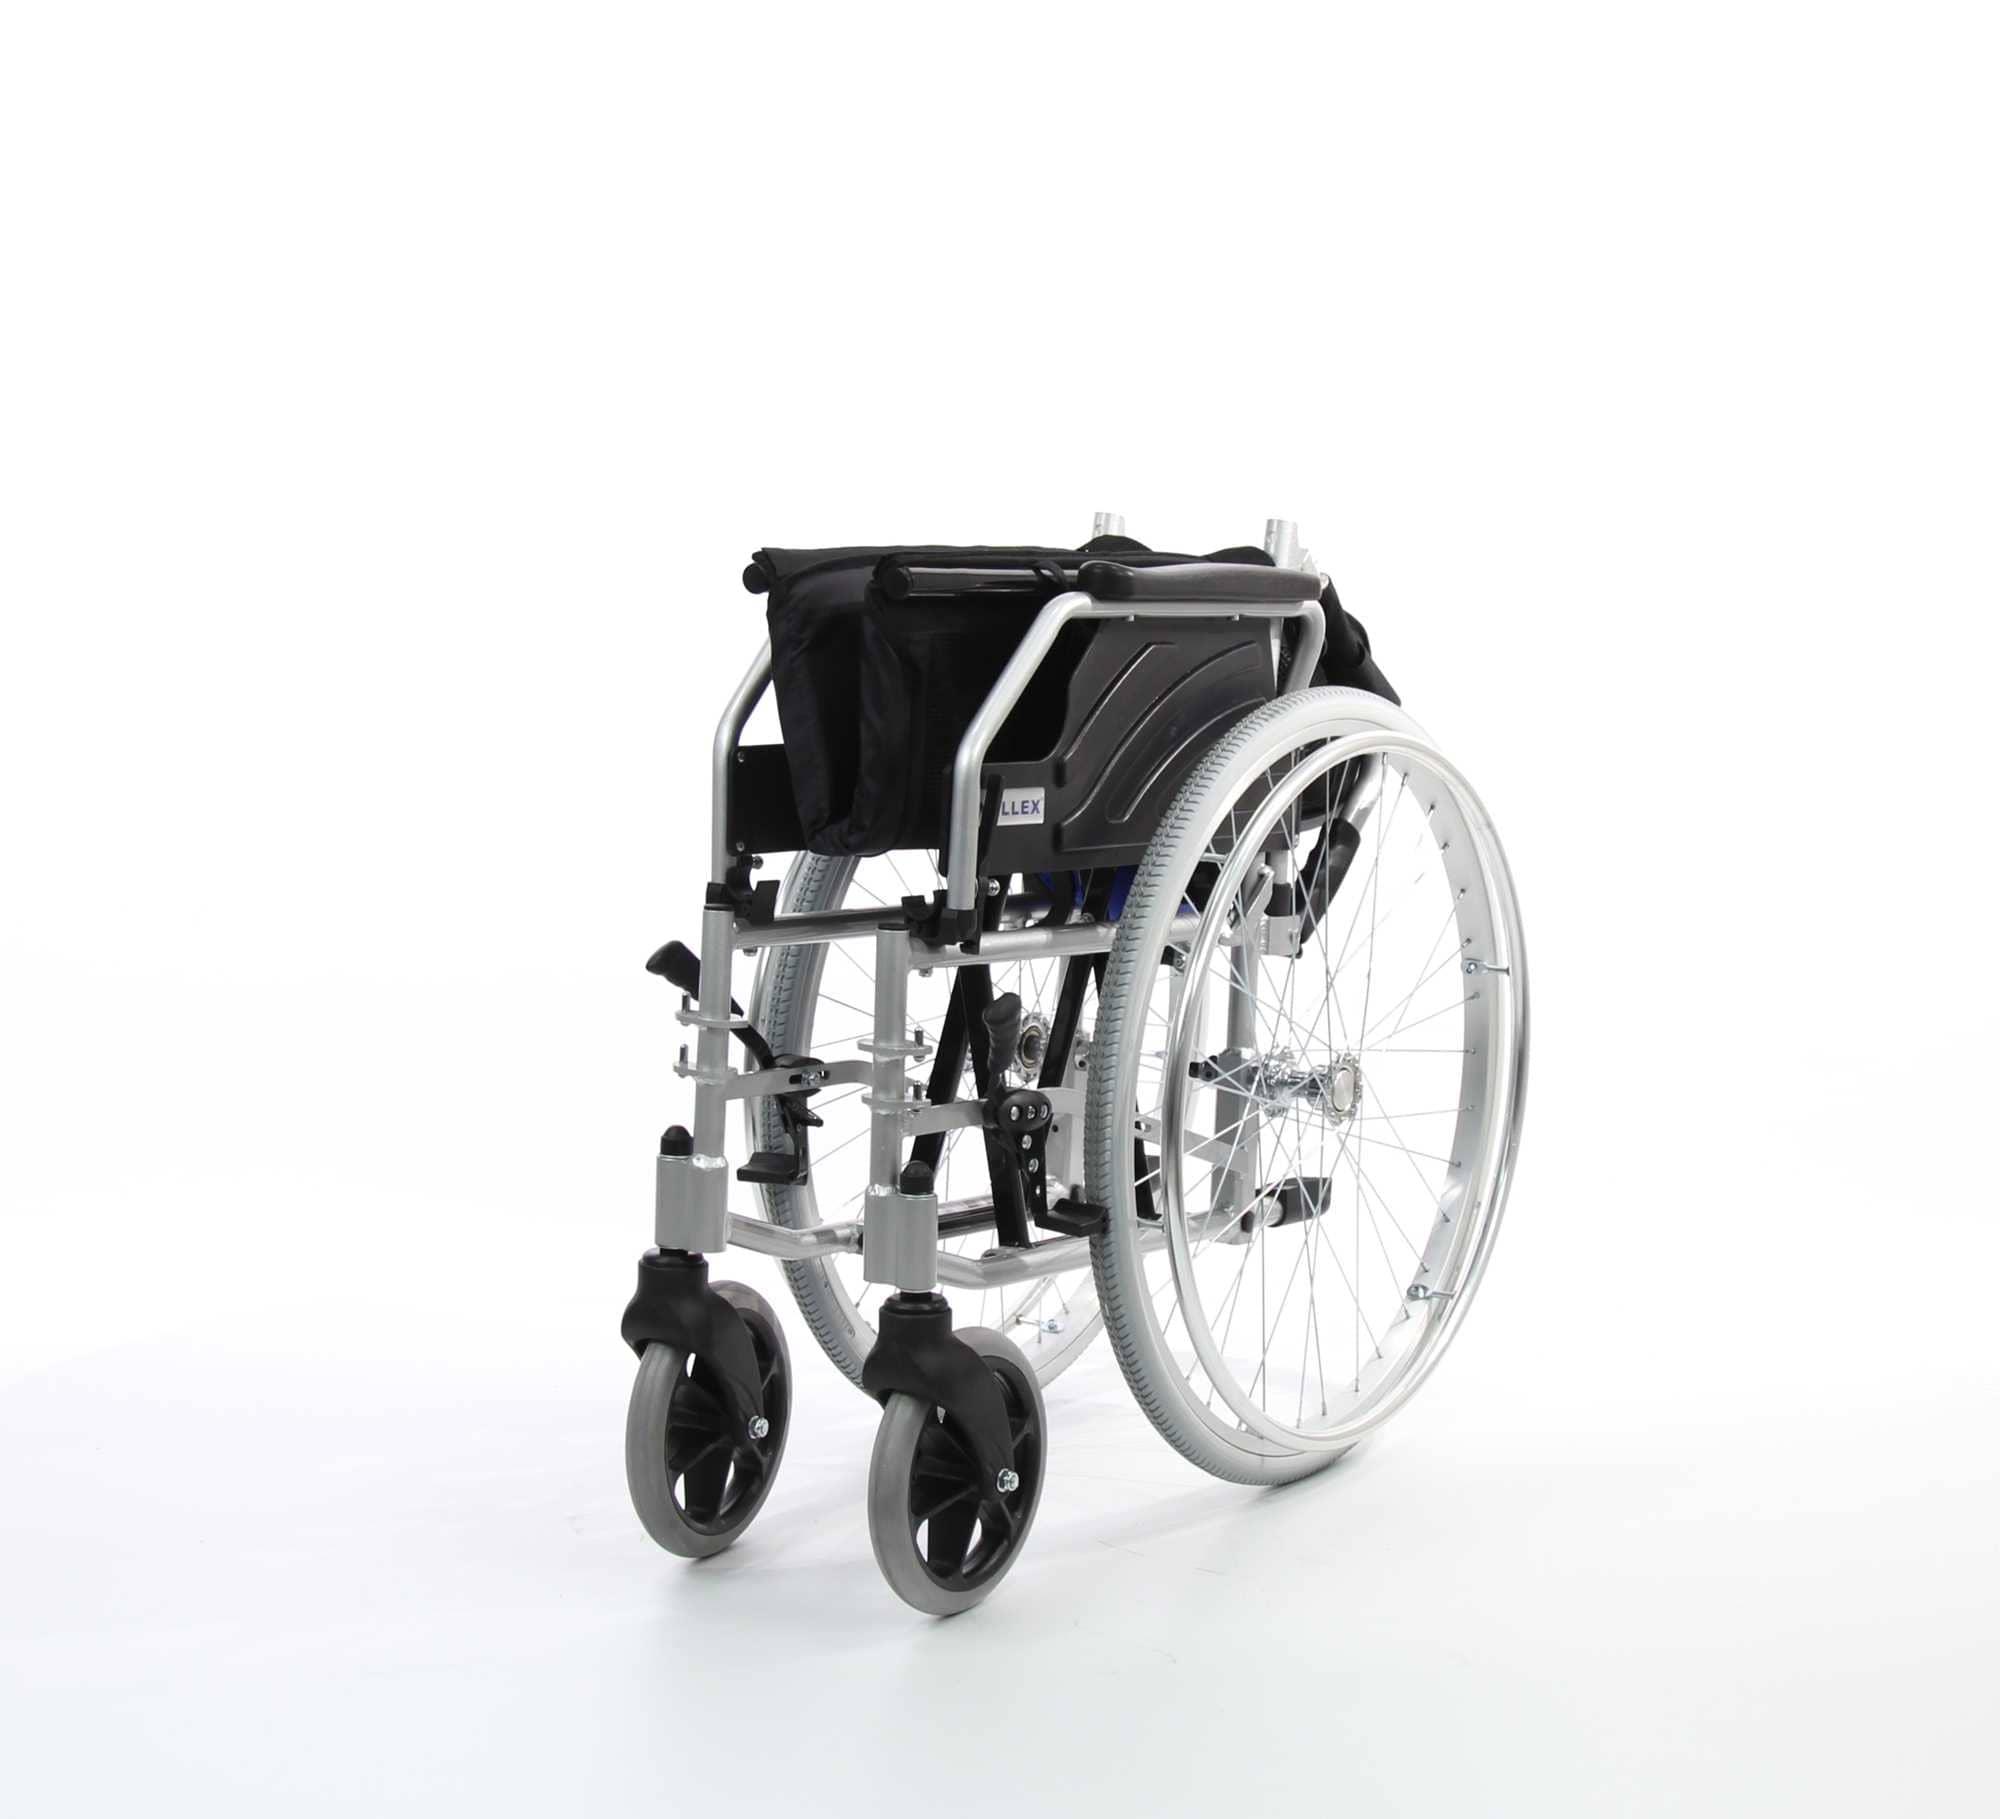 WOLLEX W217 Aluminyum Hafif Manuel Tekerlekli Sandalye